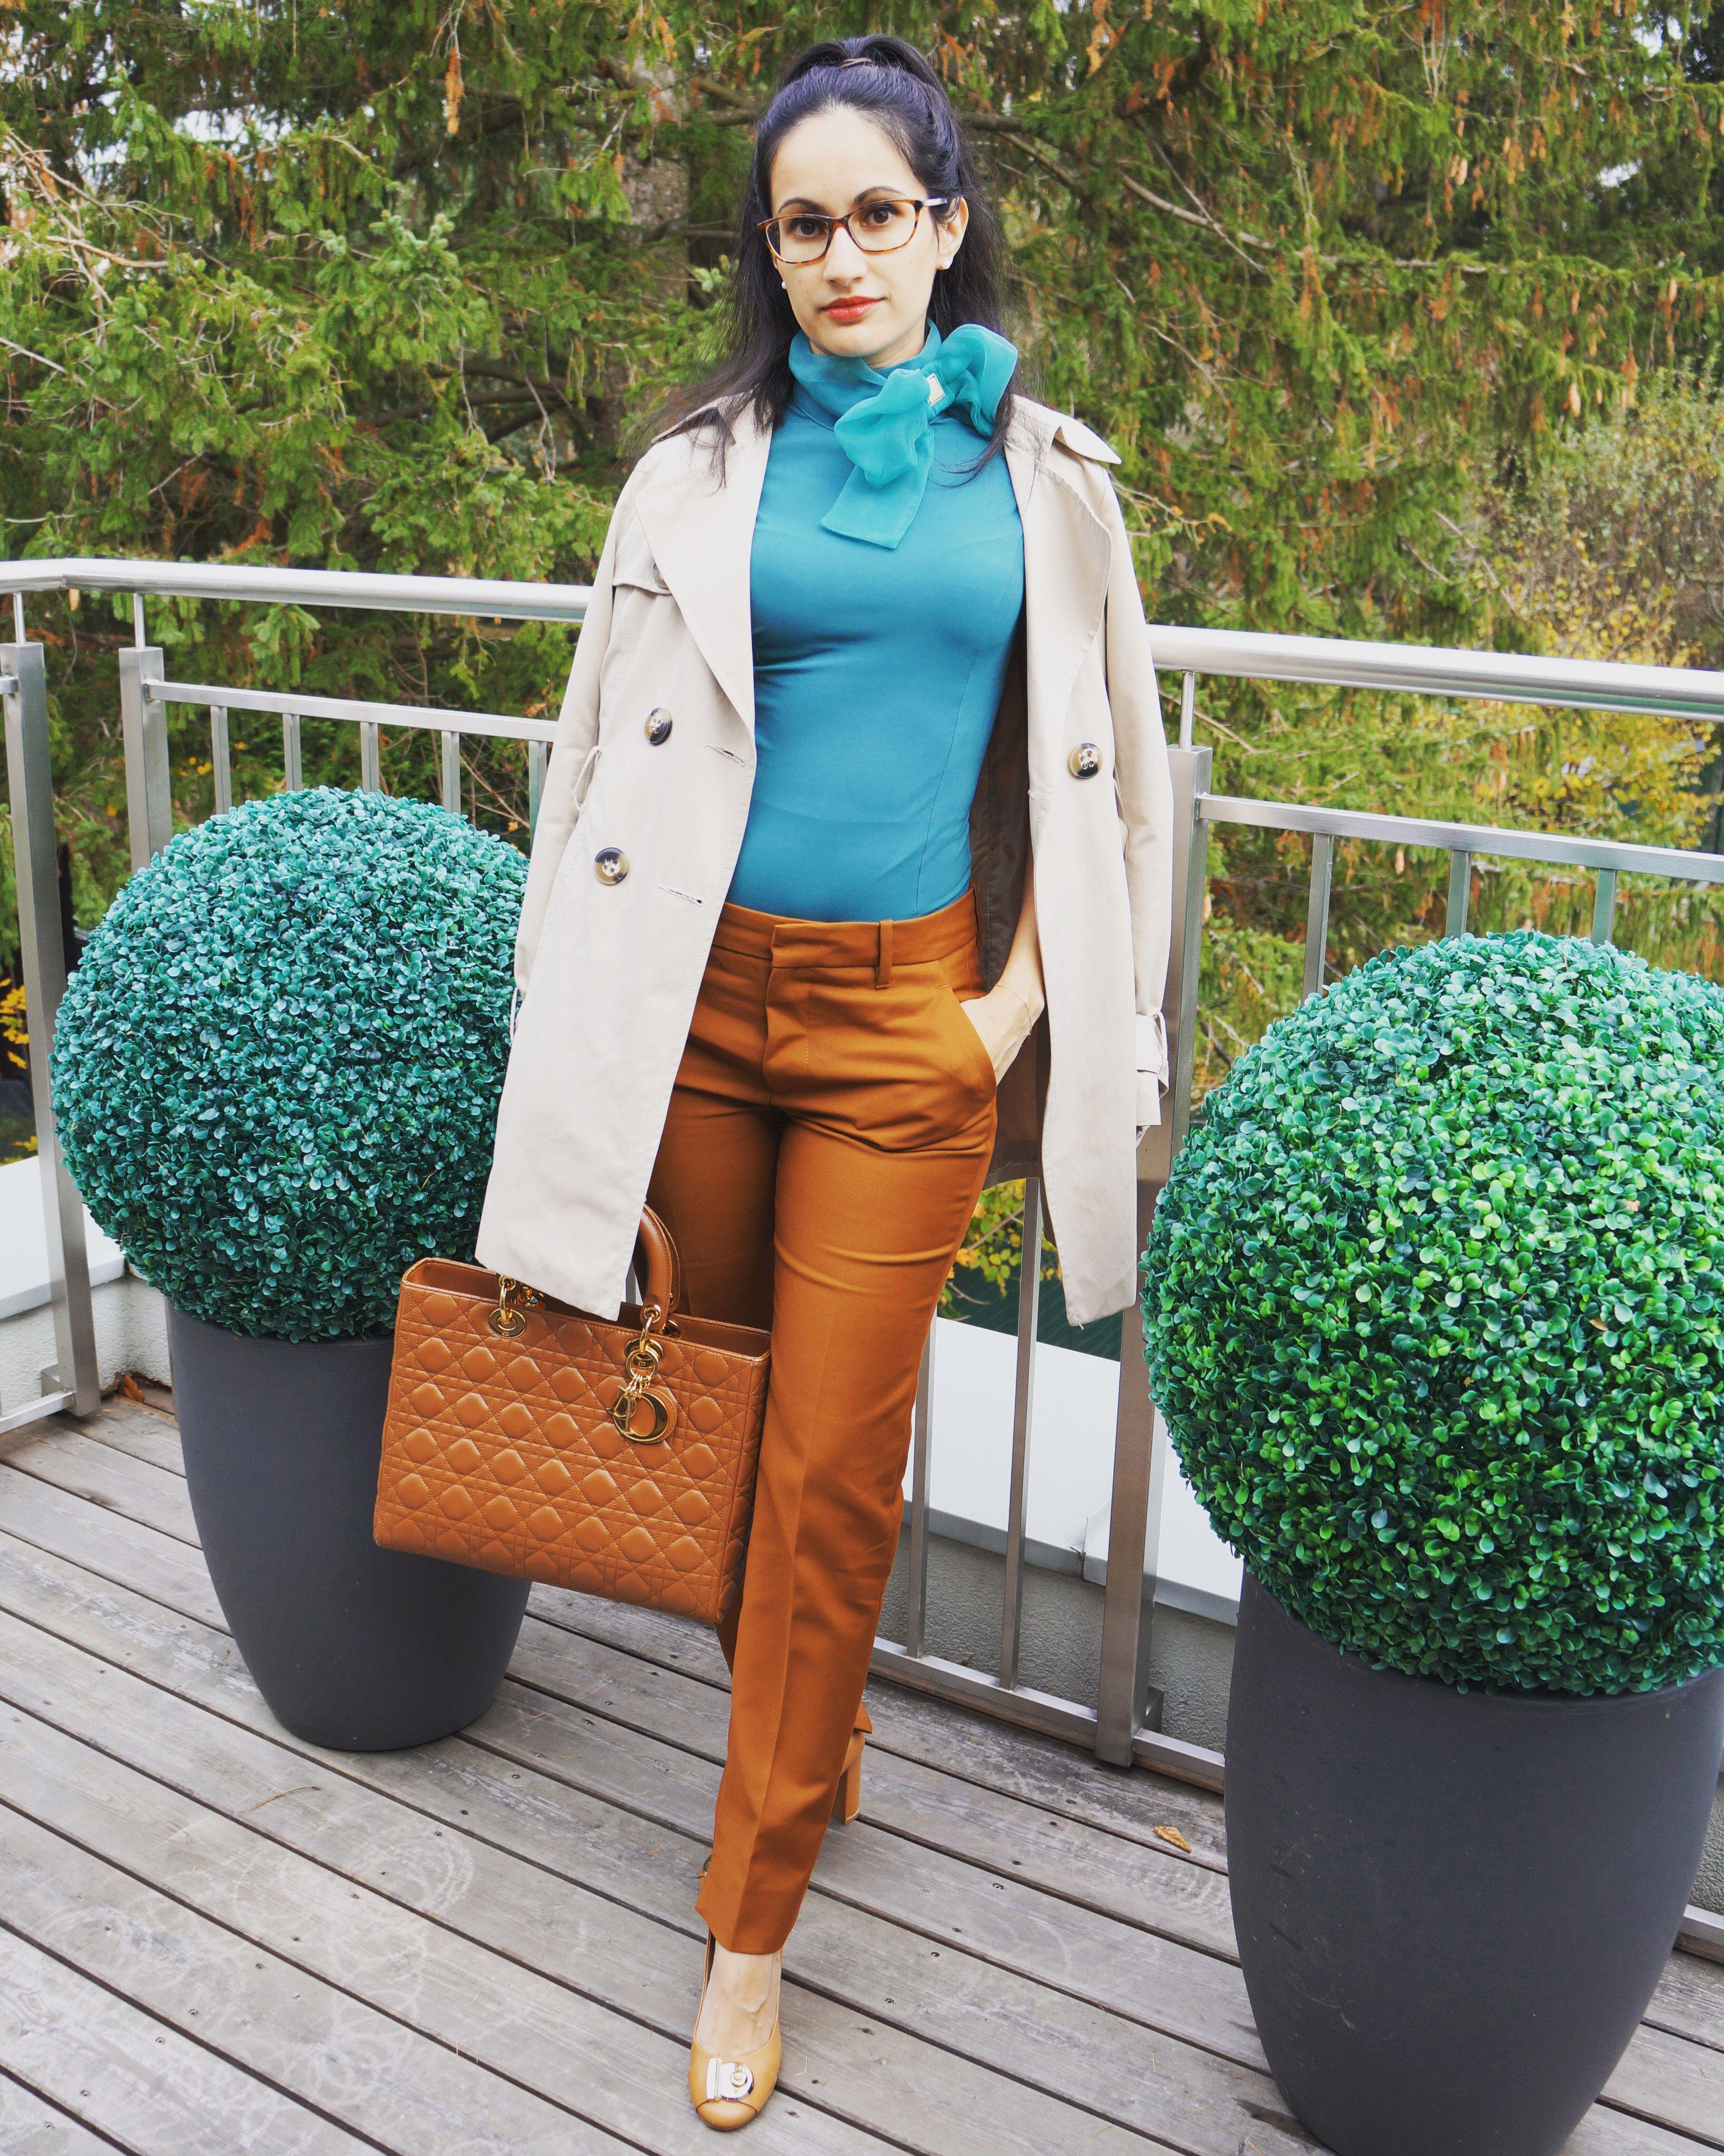 Trousers By Zara Body By Elisabetta Franchi Shoes By Ferragamo